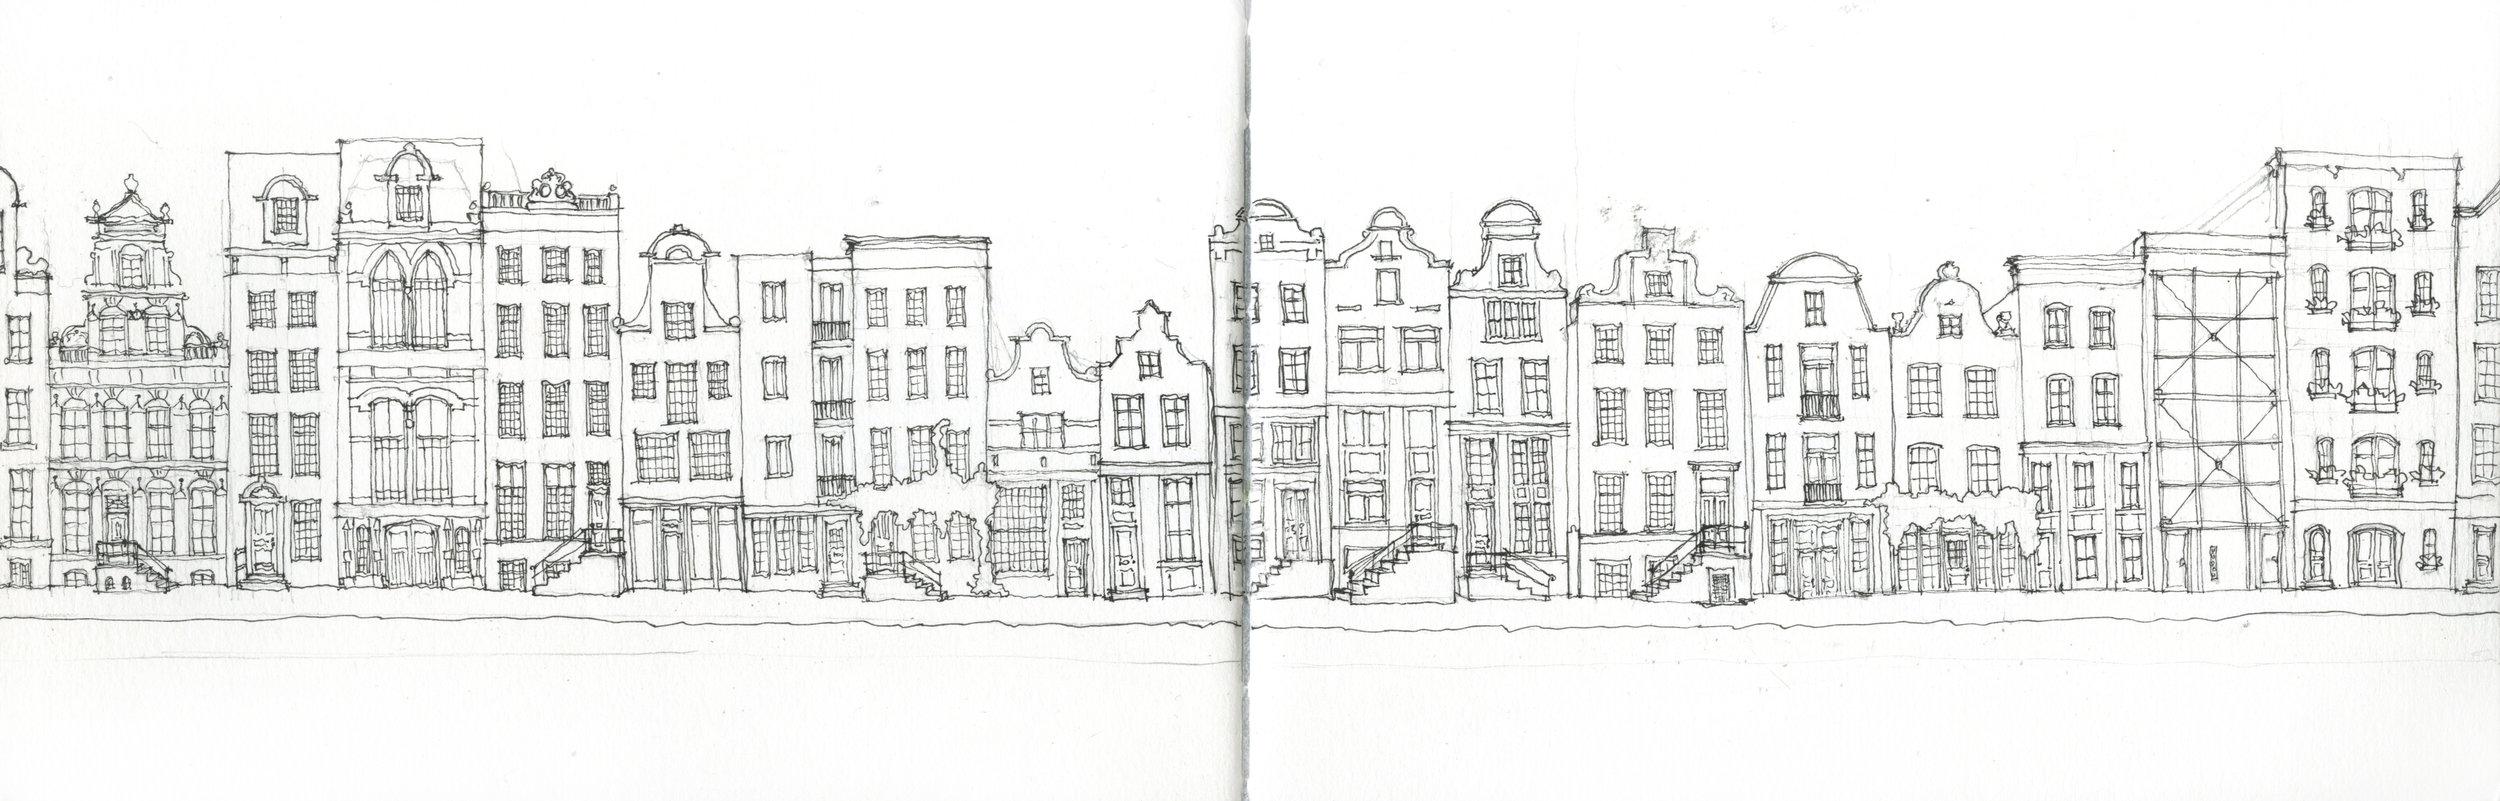 Amsterdam-ClassicCanal2.jpg